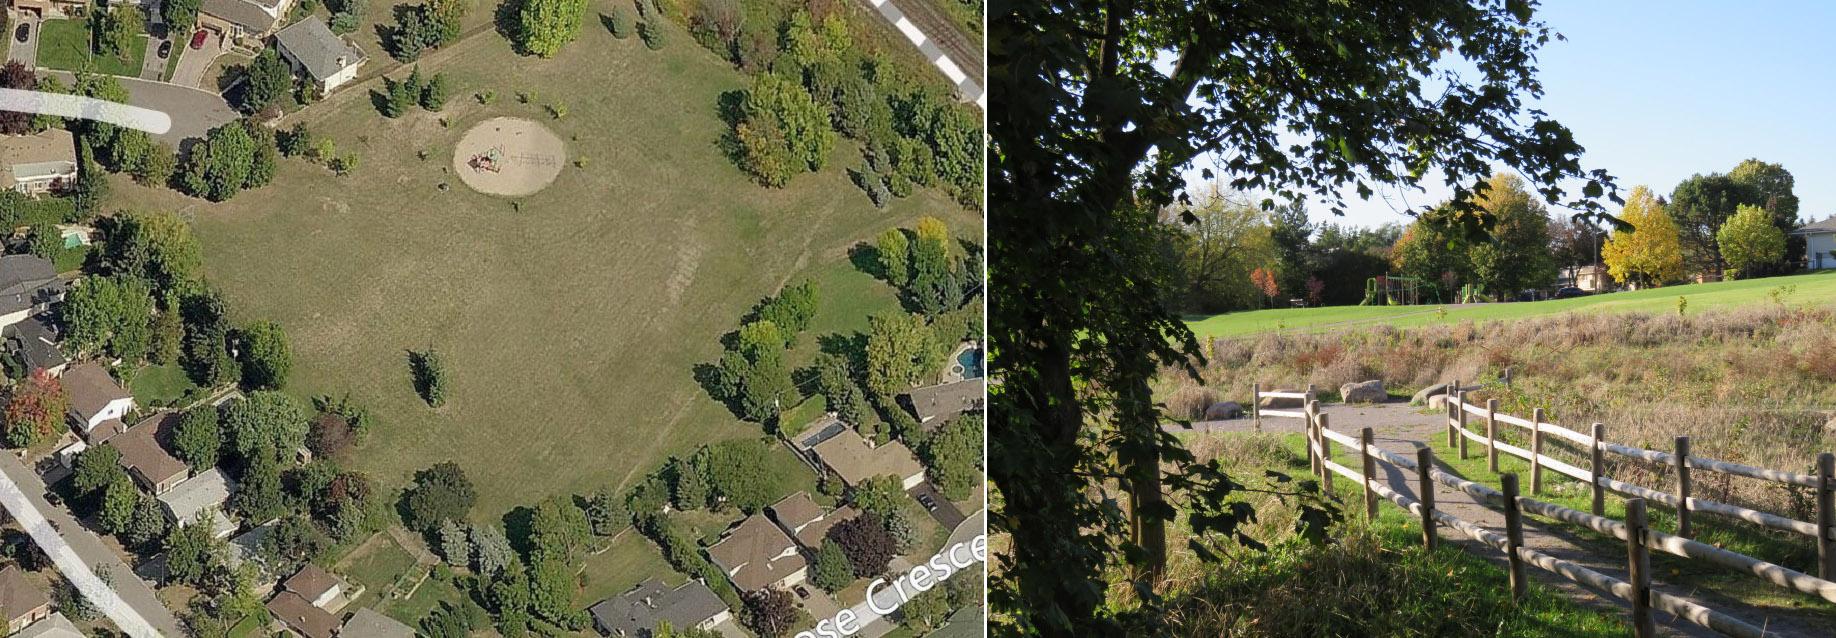 Glencrest Park before and after renewal